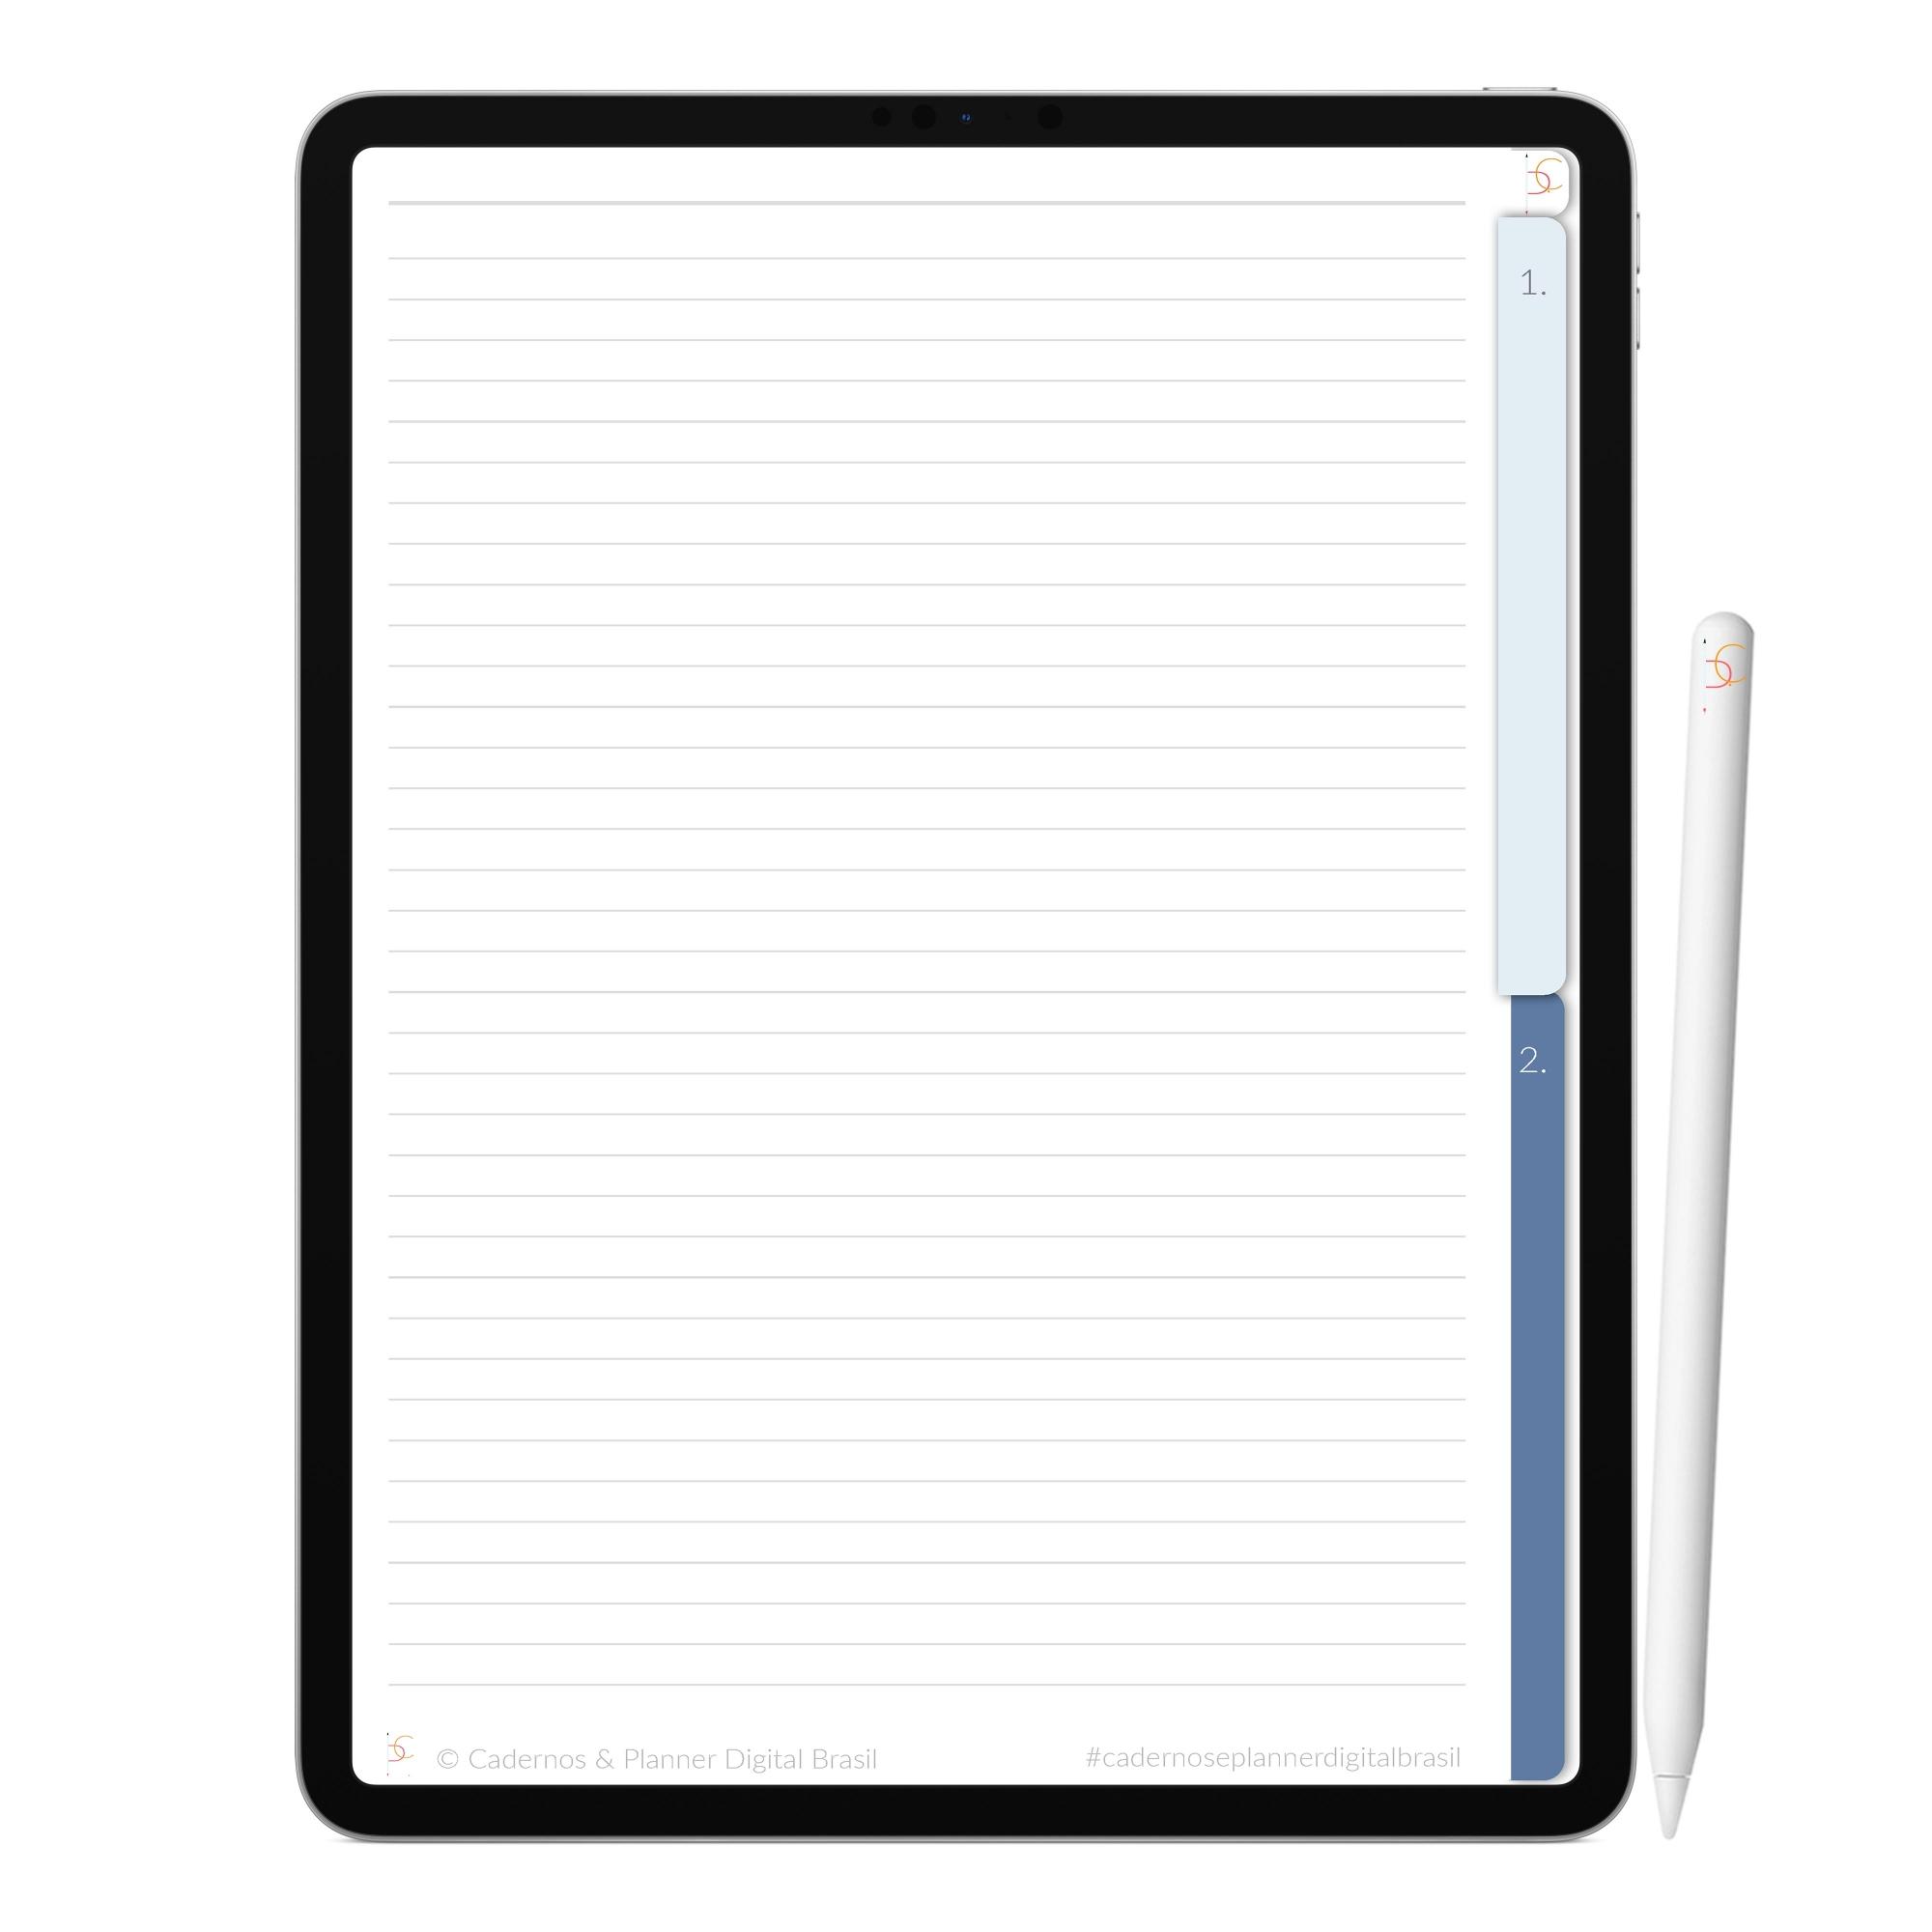 Caderno Digital Mindful Atento | Duas Matérias Interativo| iPad Tablet | Download Instantâneo